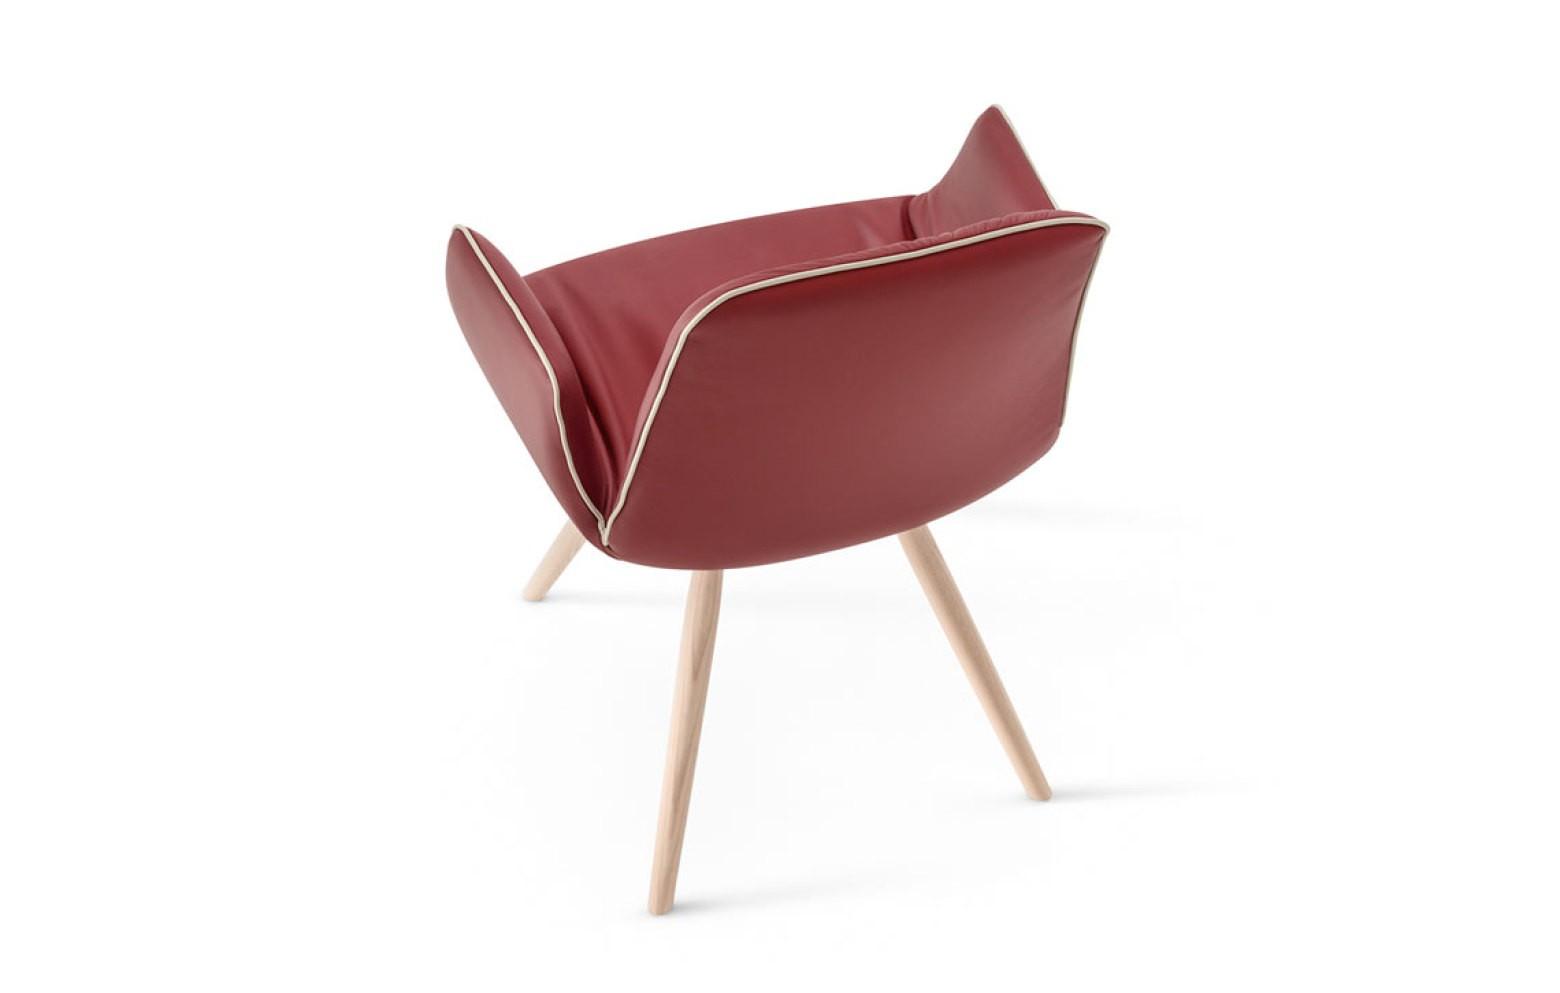 lisa arm st hle online outlet who 39 s perfect. Black Bedroom Furniture Sets. Home Design Ideas